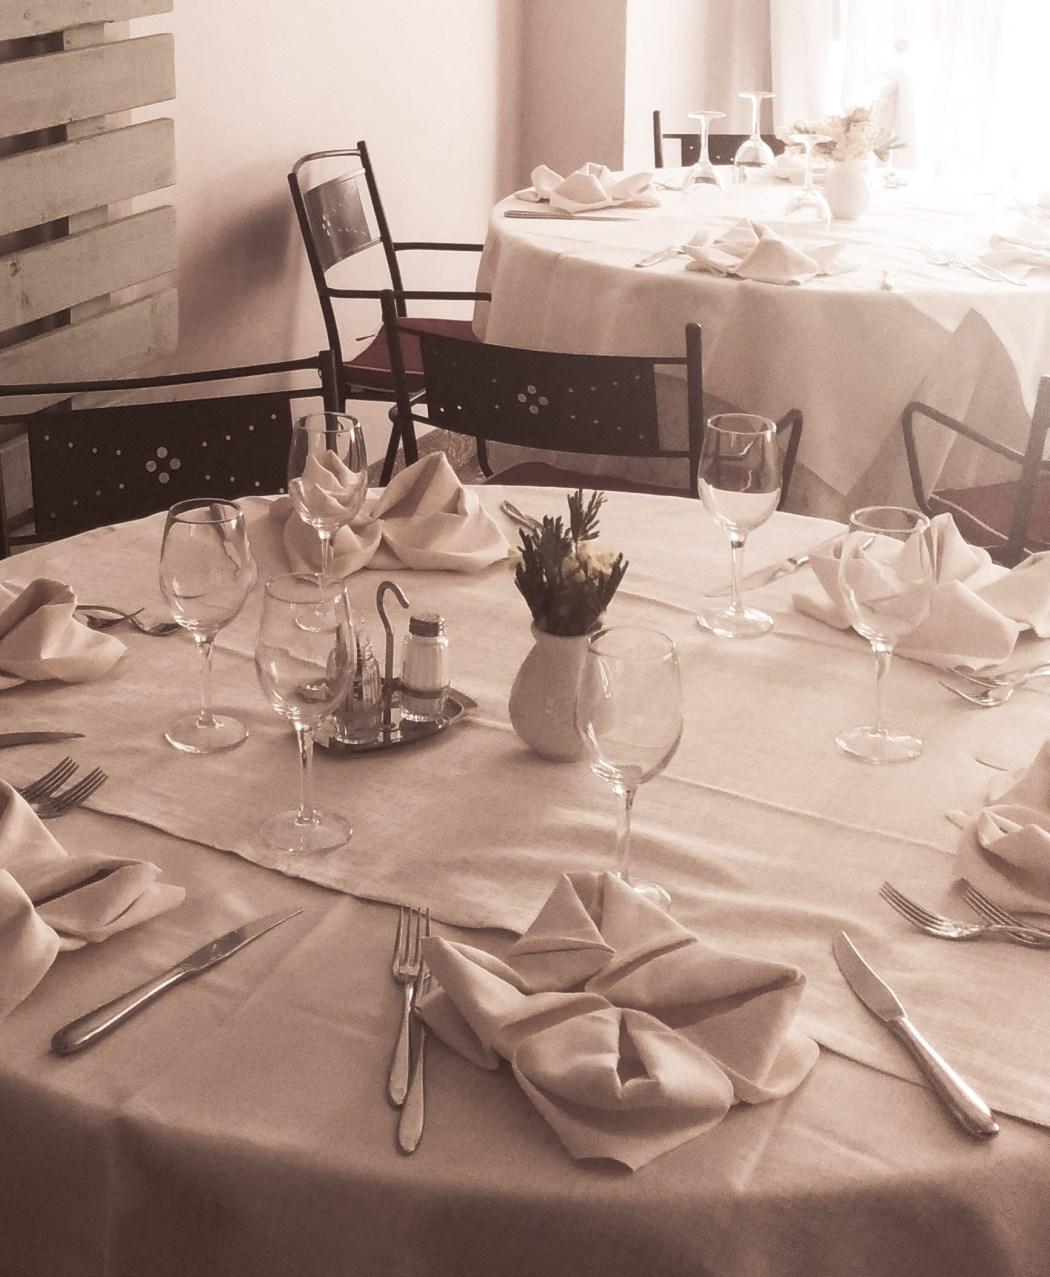 Dove mangiare a Parma | Ristorante Pizzeria Luna Blu Parma